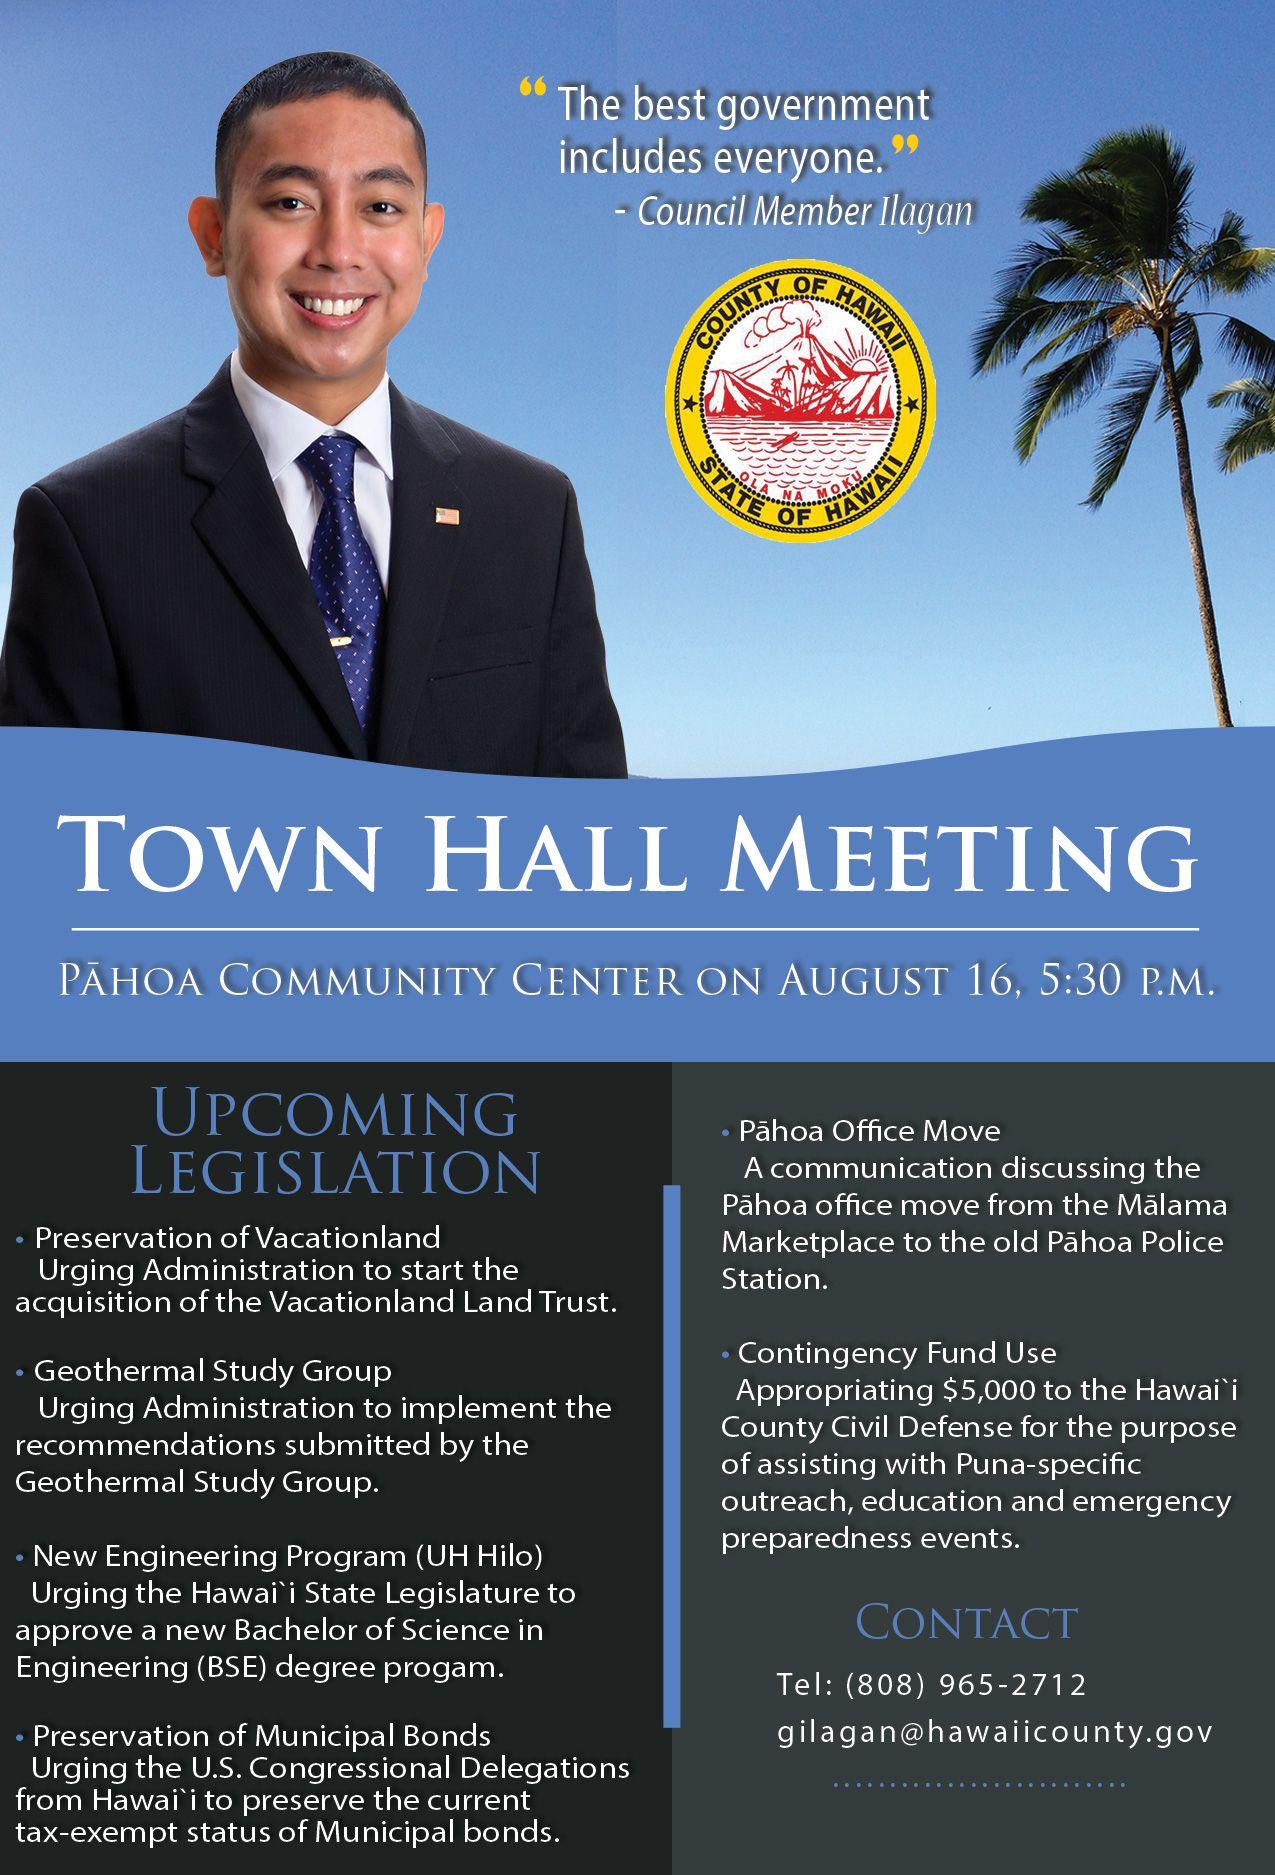 Town Hall Meeting Flyer FINAL | new | Pinterest | Town hall ...